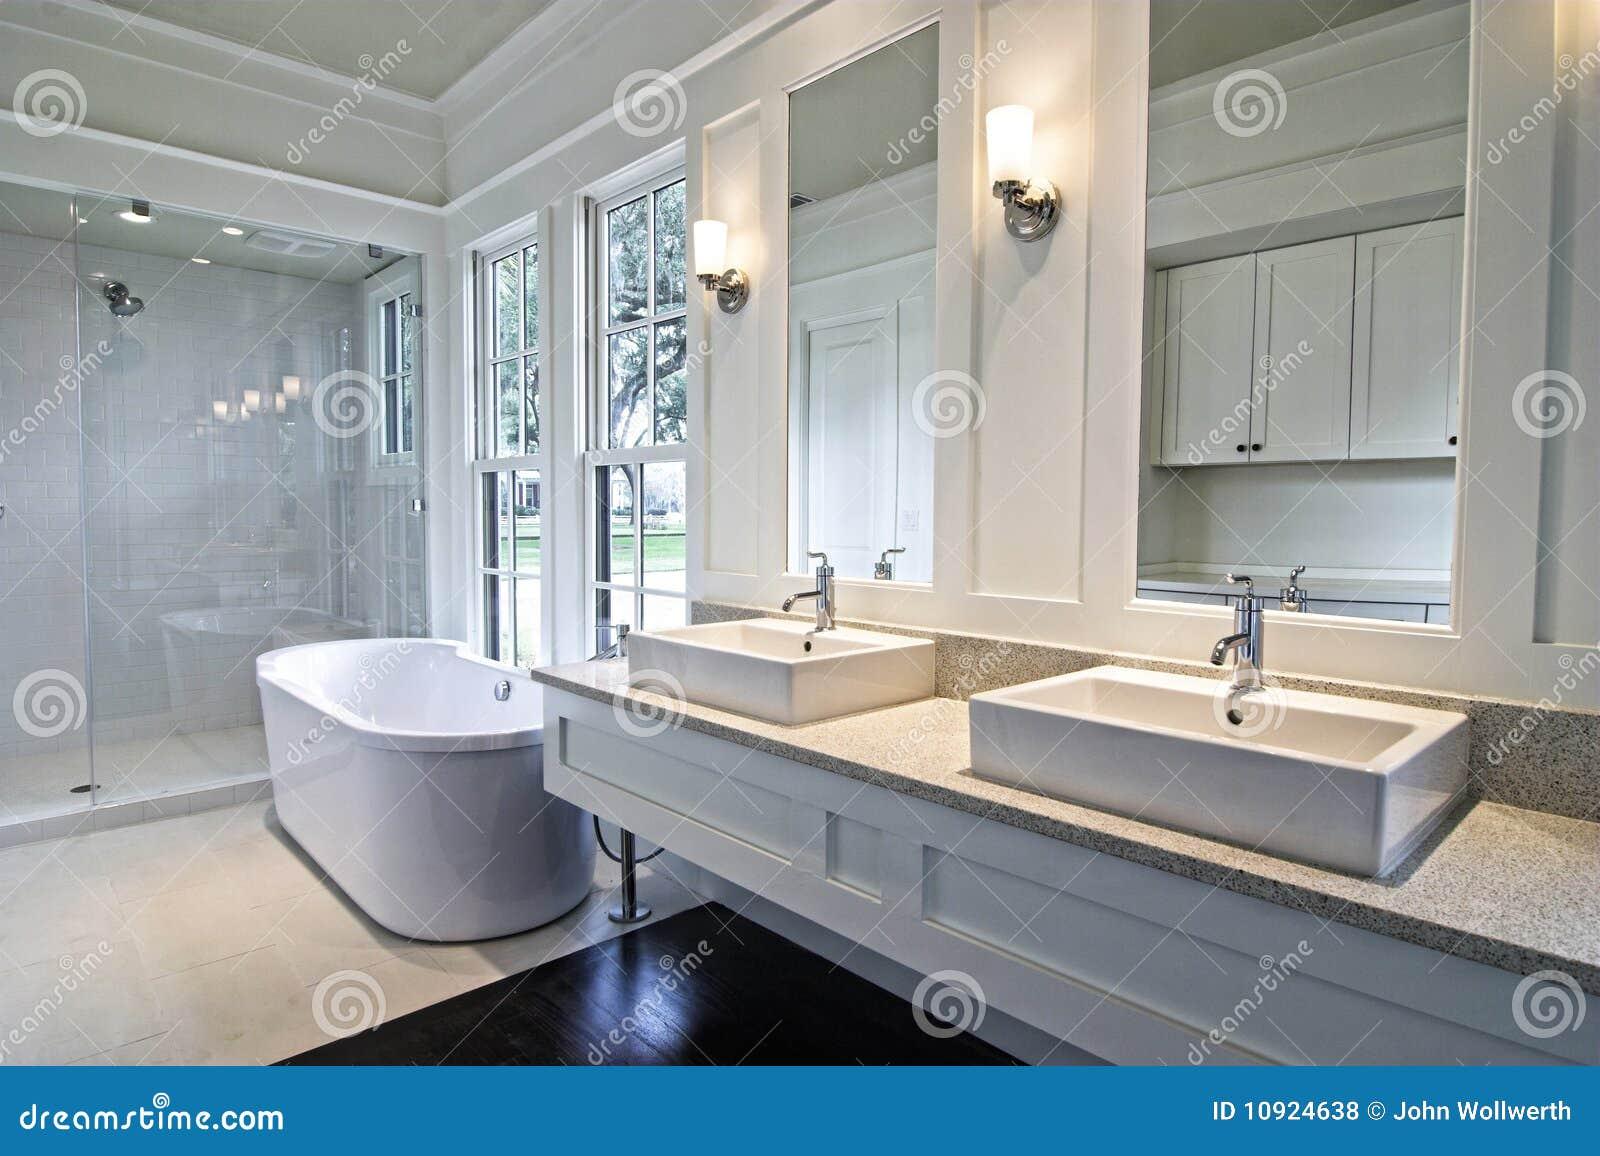 Banheiro Branco Moderno Fotos de Stock Royalty Free  Imagem 10924638 -> Armario De Banheiro Bosi